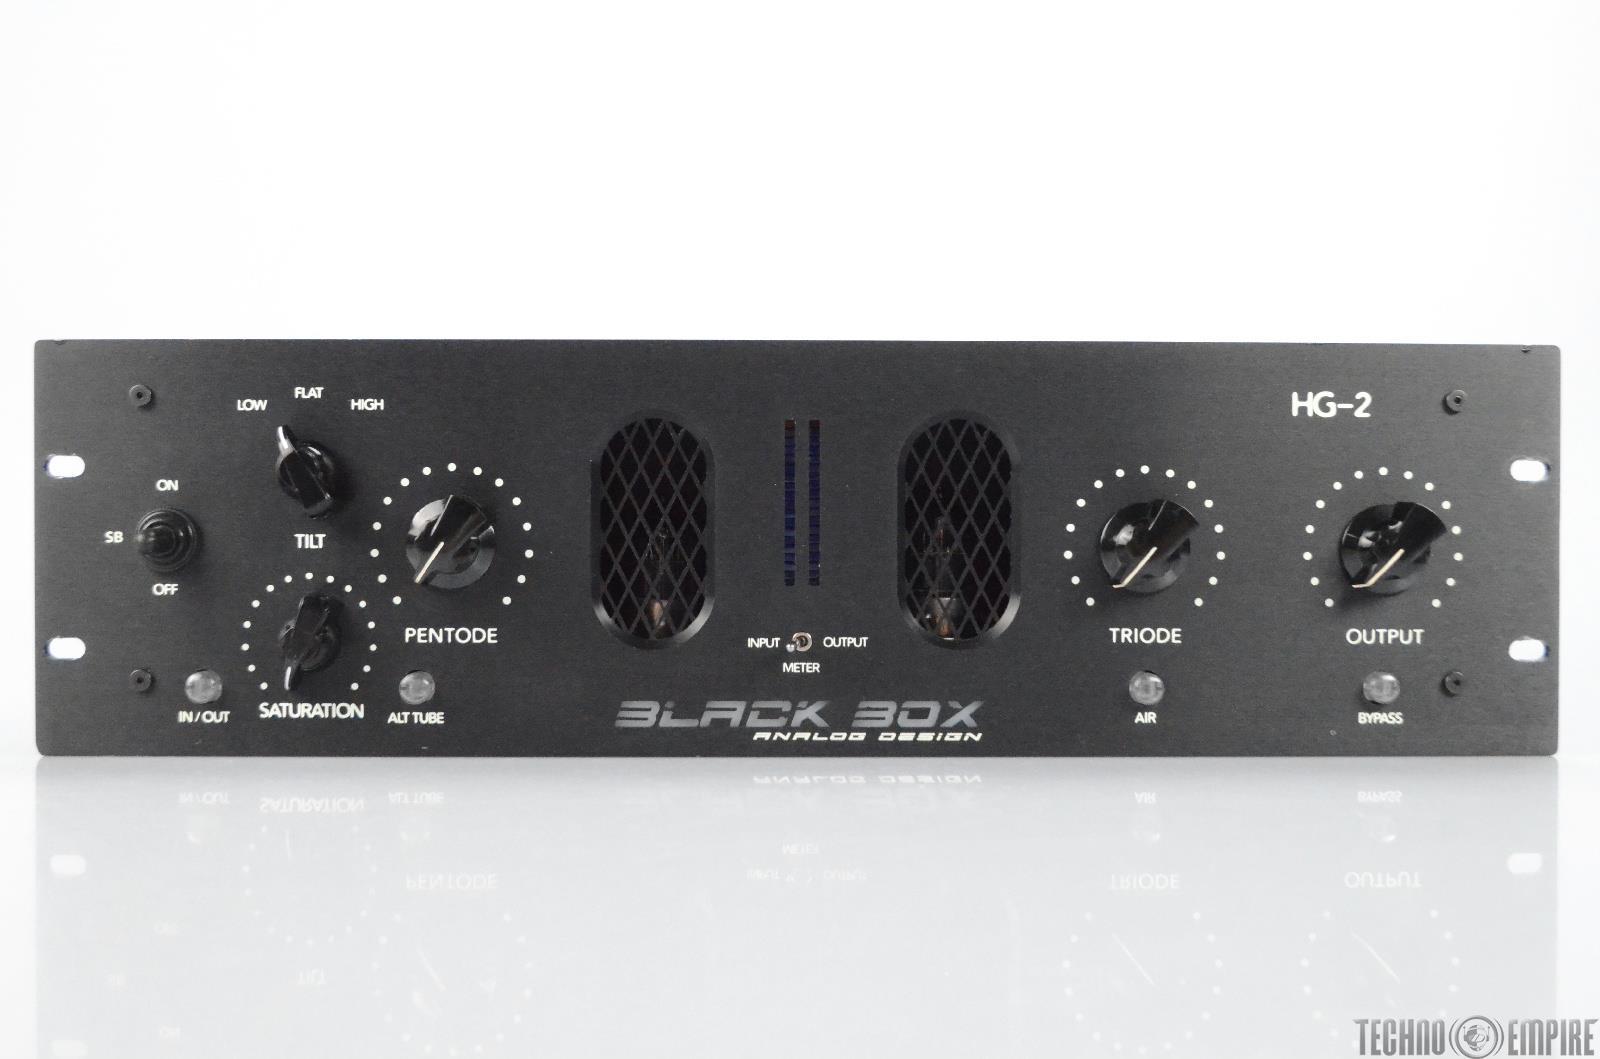 Black Box Analog Design HG-2 Tube Saturator Compressor Prototype HG2 #31561